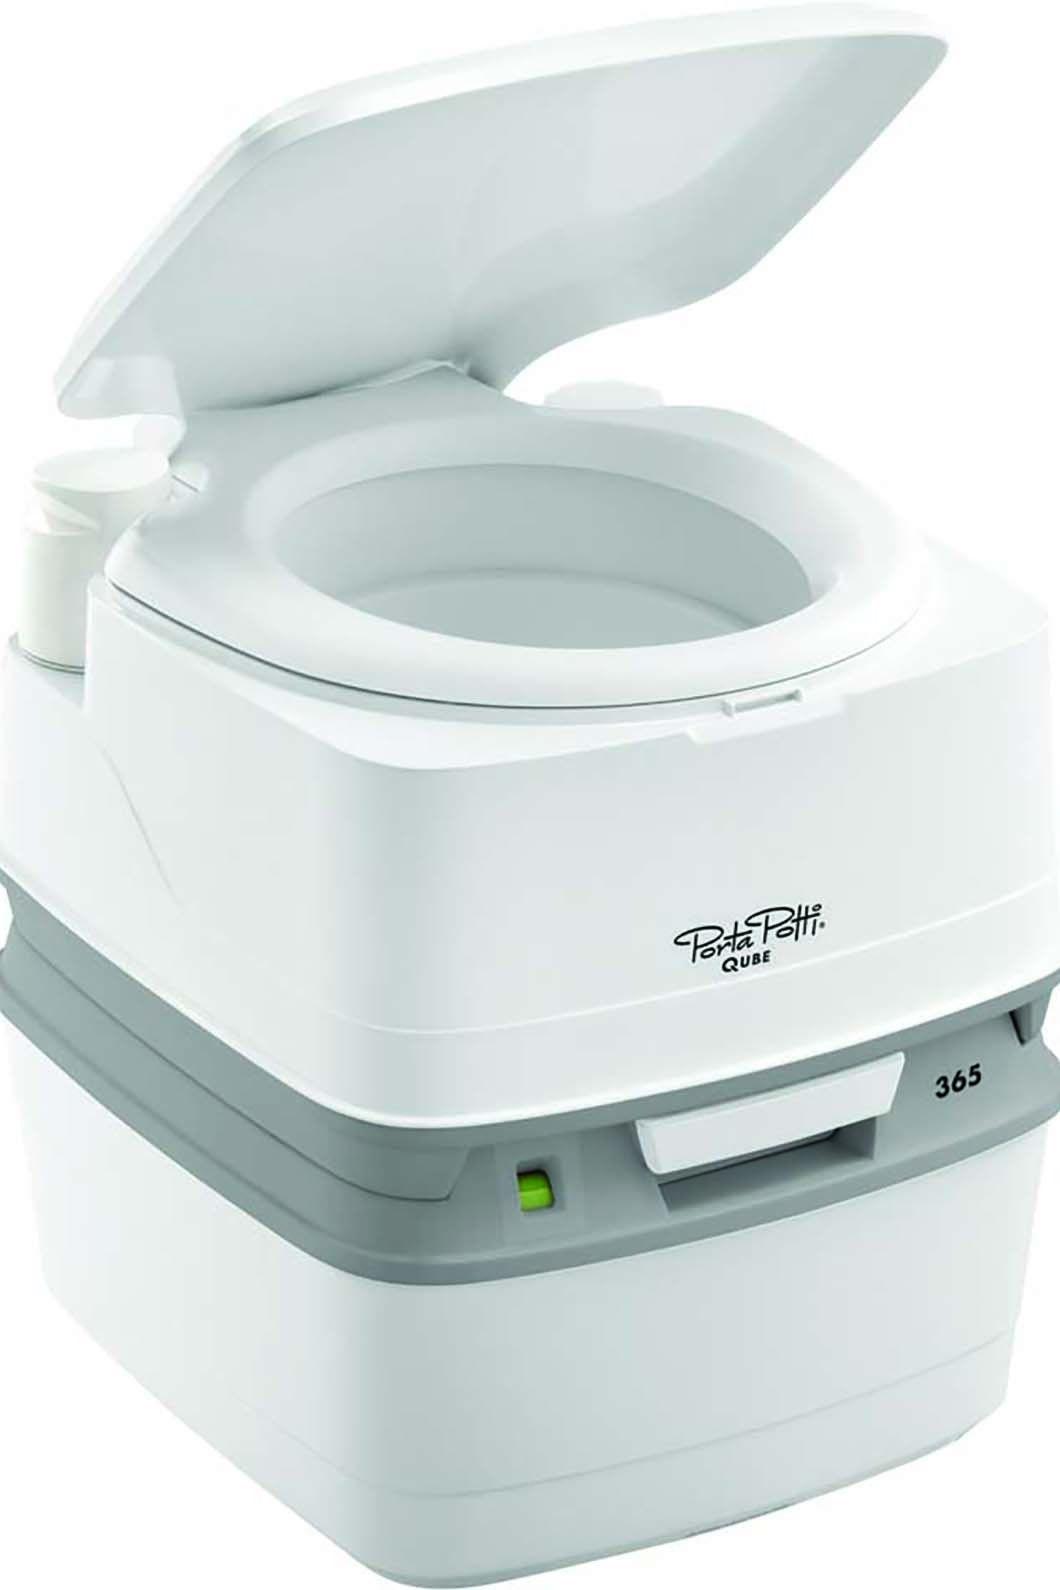 Thetford Porta Potti Qube 365 Portable Toilet, None, hi-res